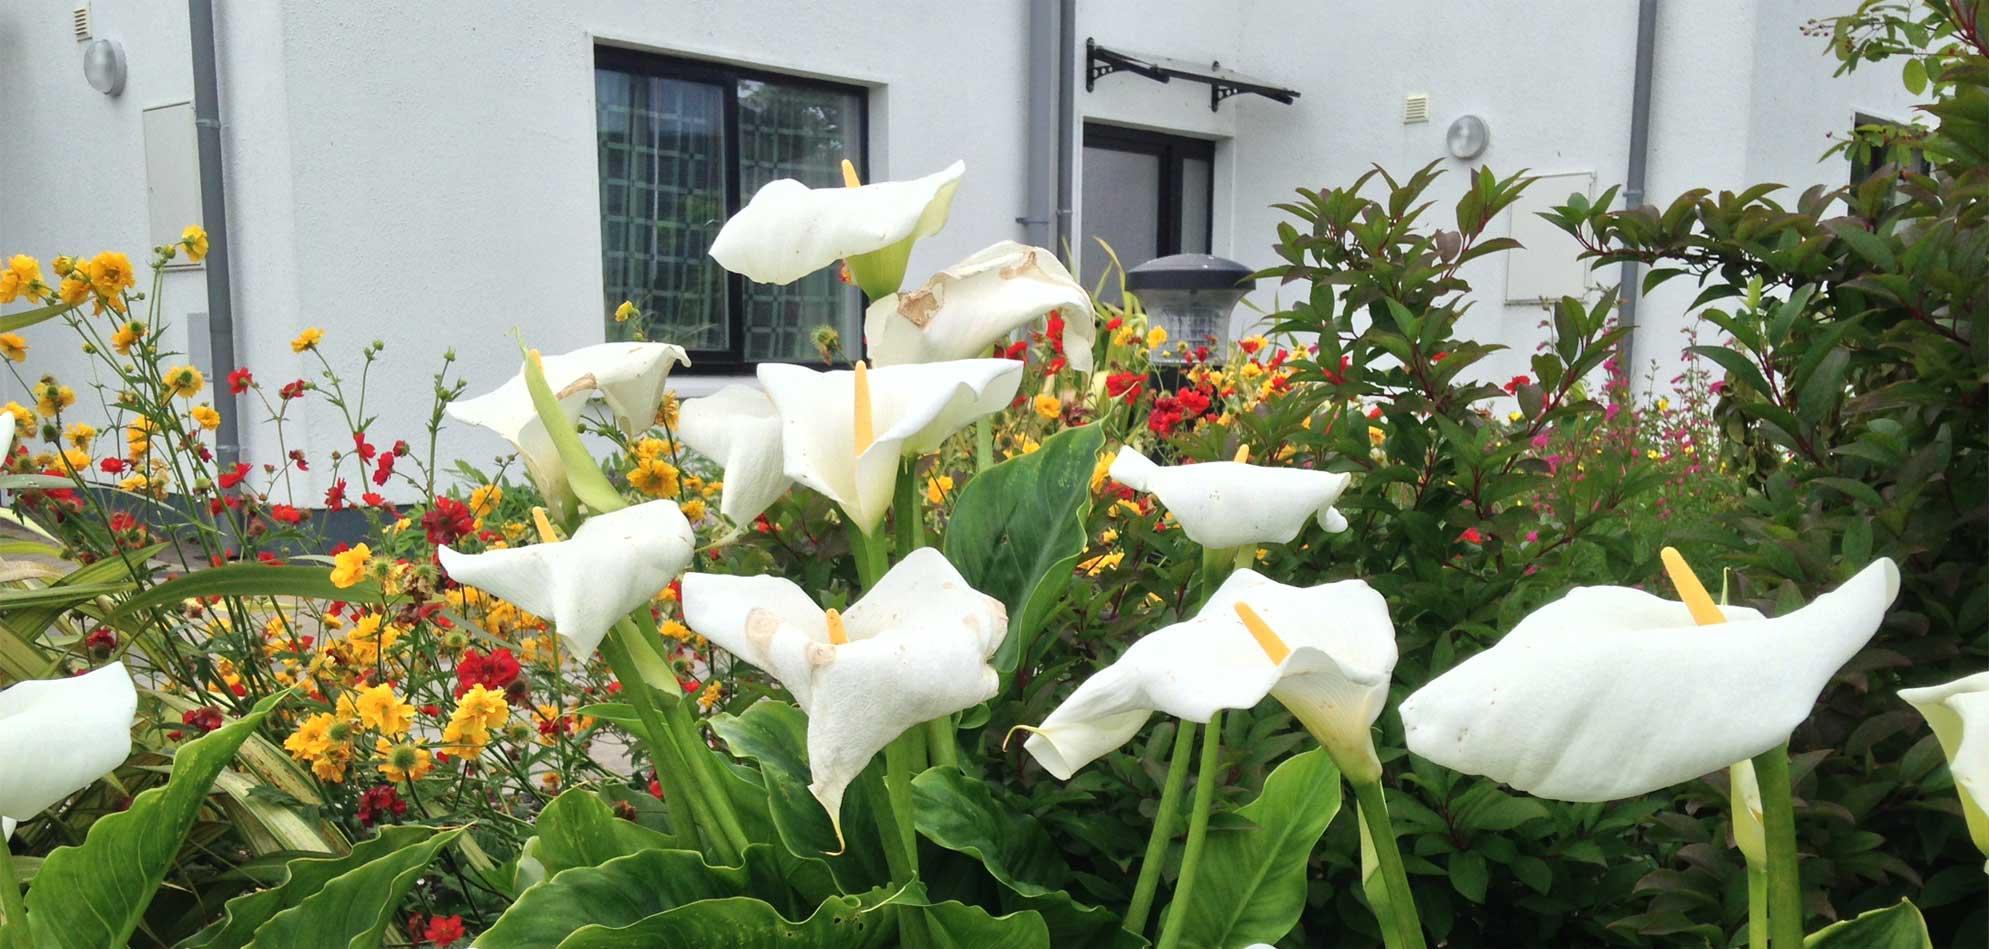 Lilys-in-the-garden